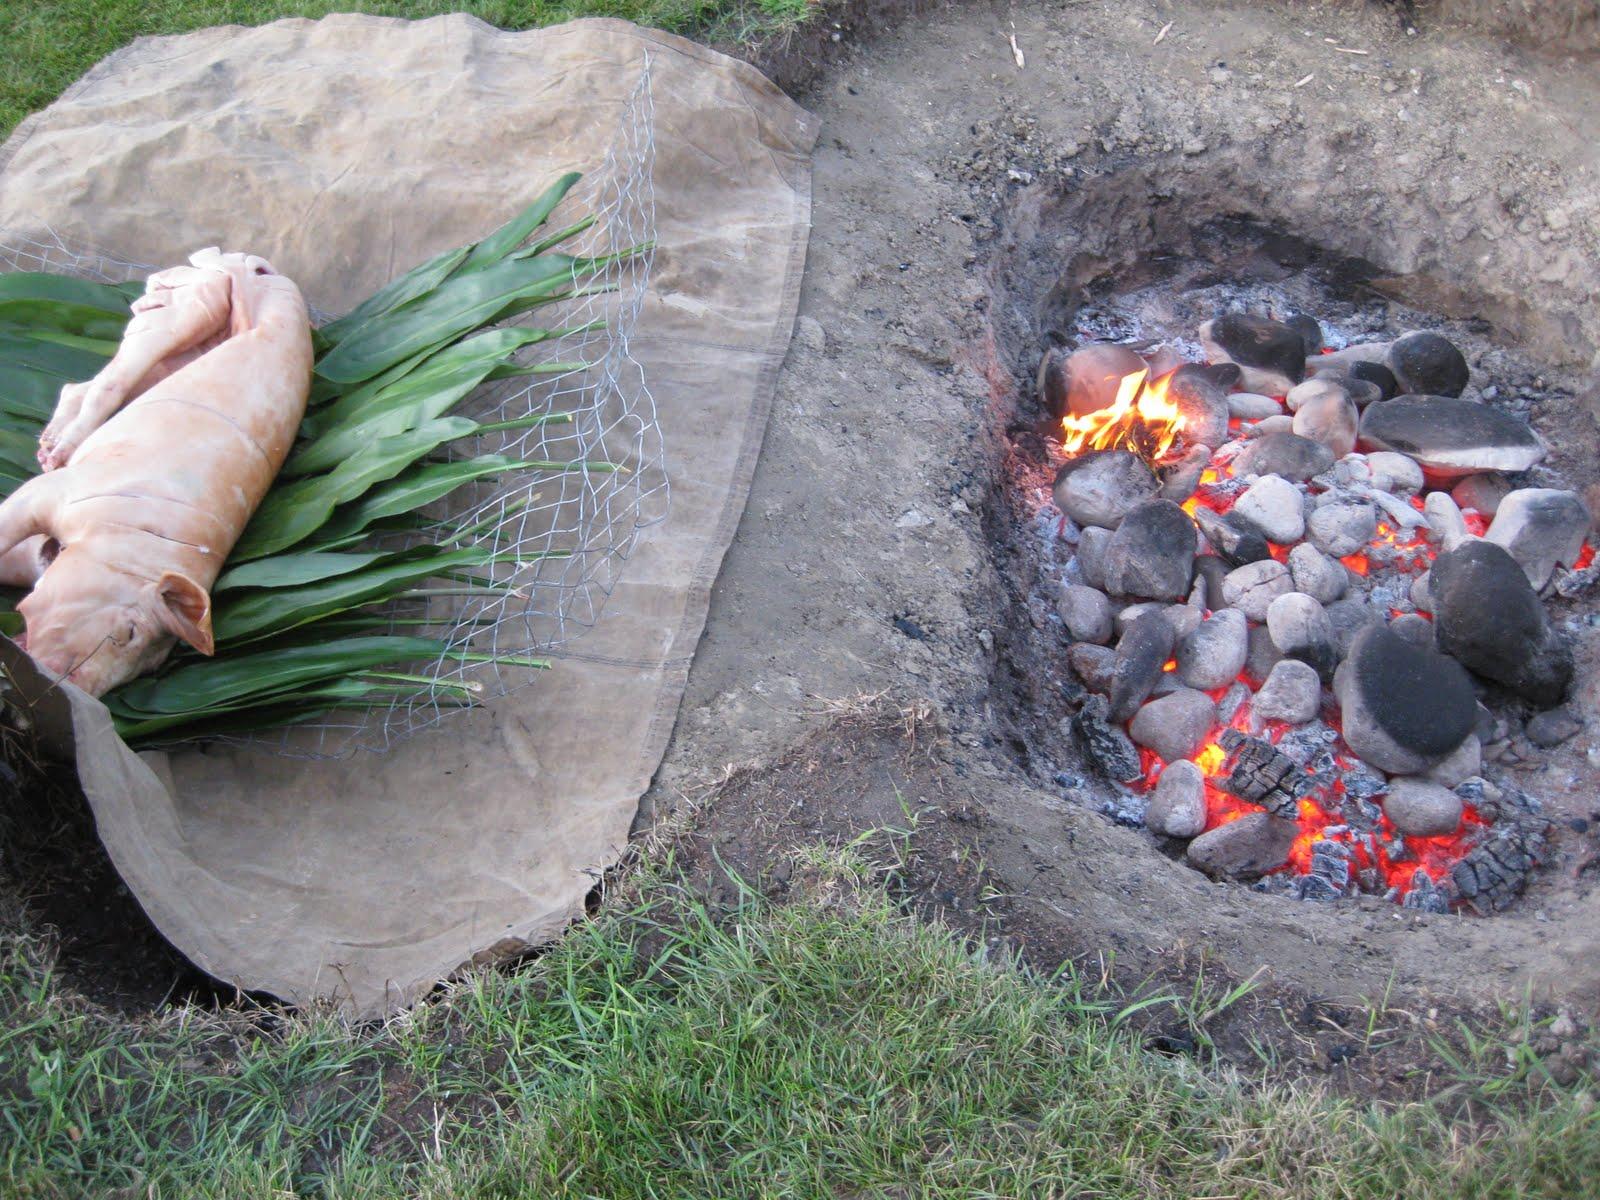 Lumsden FLorist etc.: Hawaiian Luau - How to Pit Roast a Pig